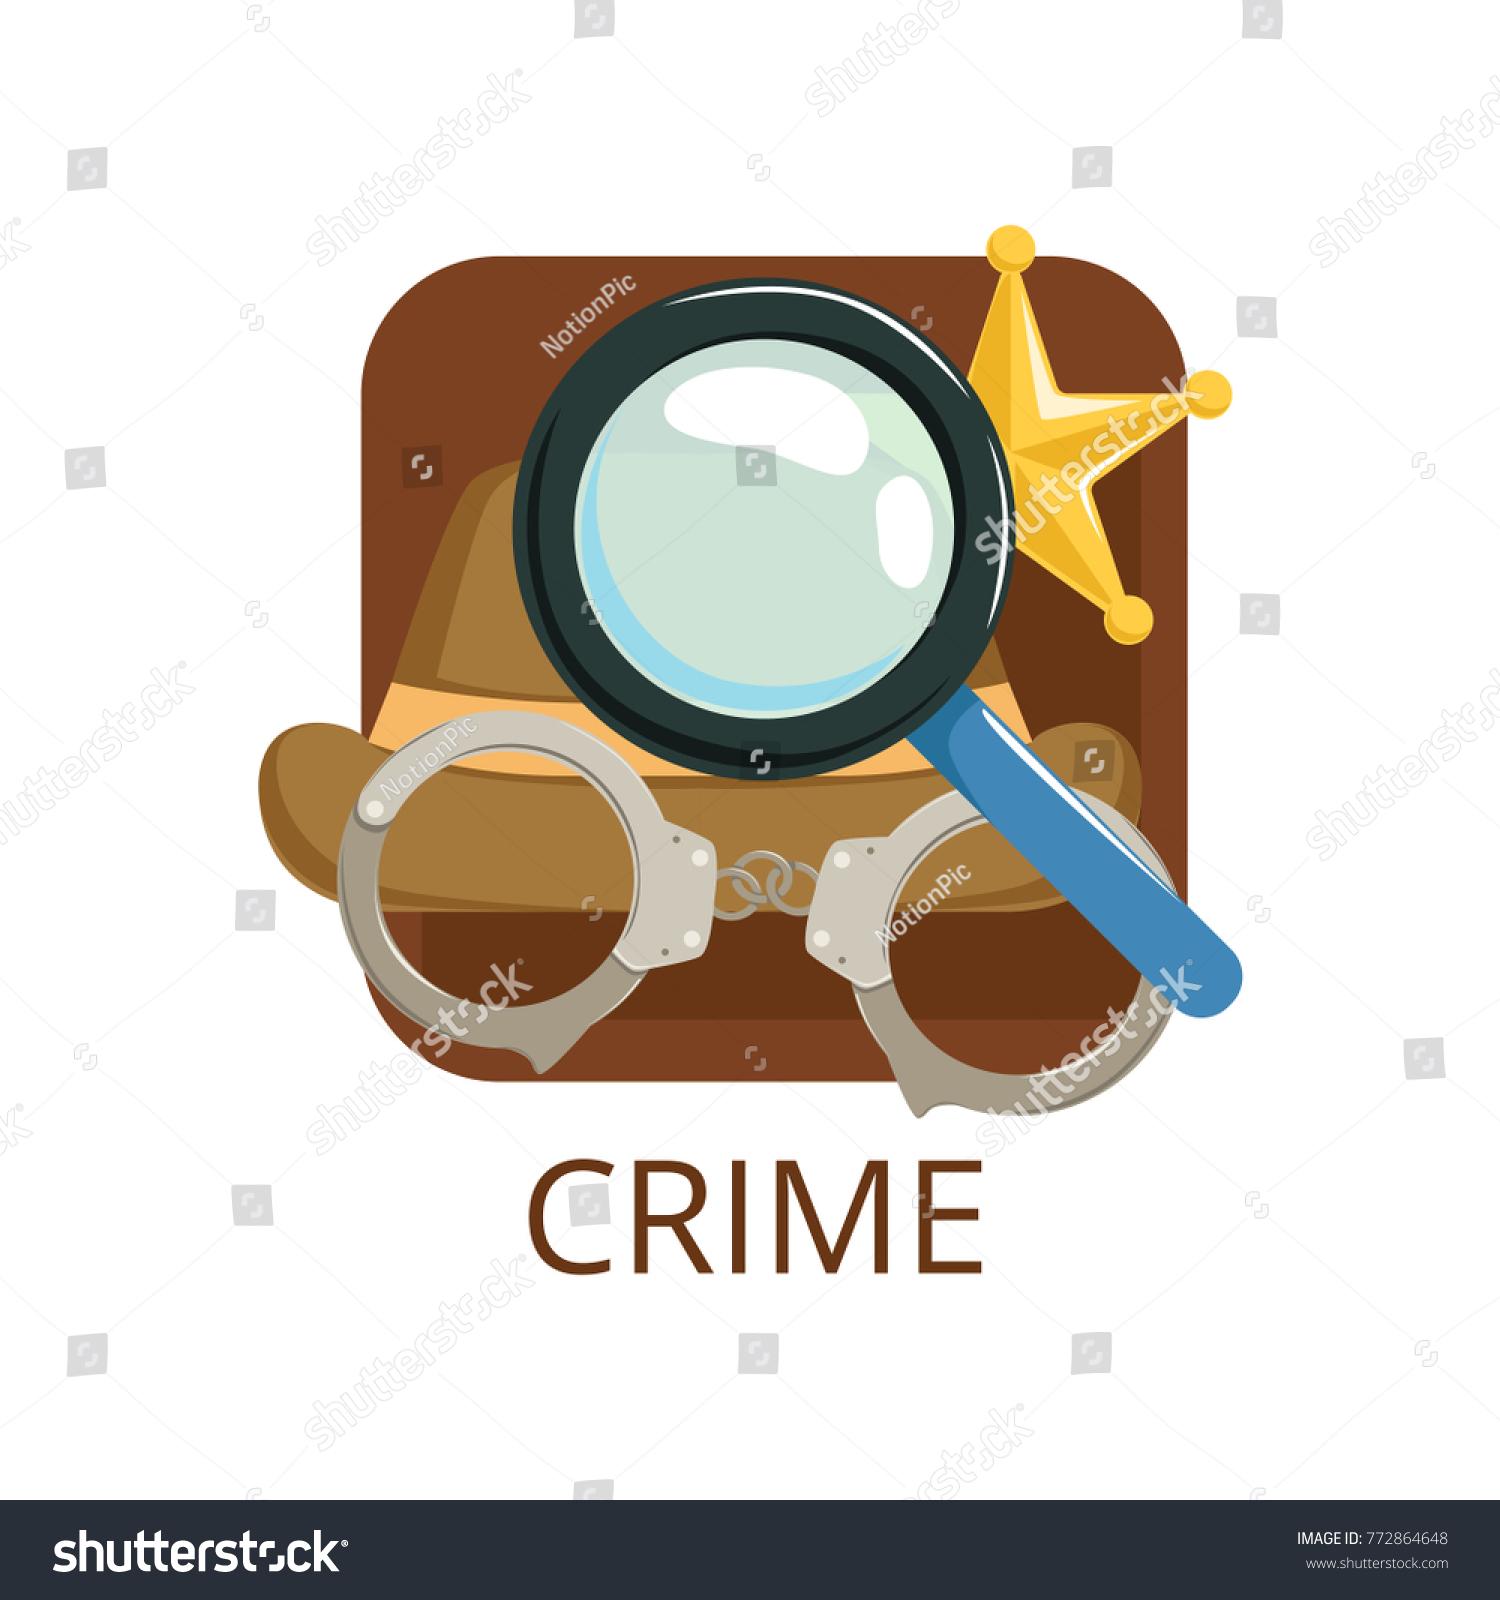 Crime cinema genre symbol cinema theatre stock vector 772864648 crime cinema genre symbol for cinema theatre channel cinematography movie production biocorpaavc